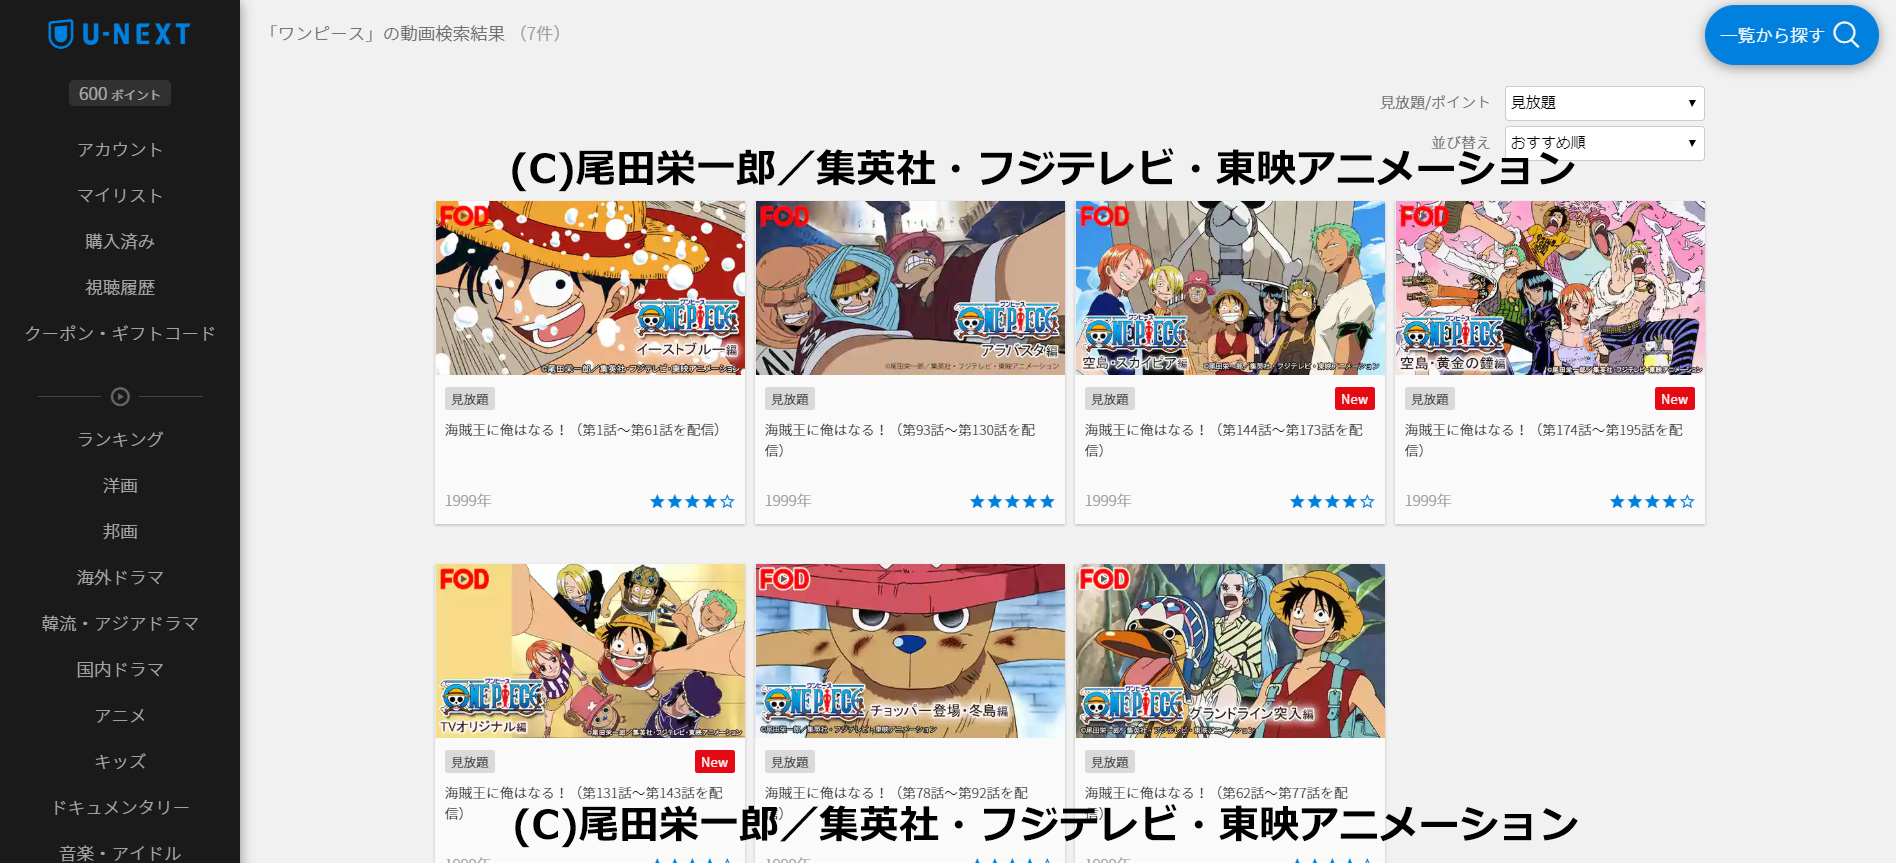 U-NEXTはアニメも観れます!